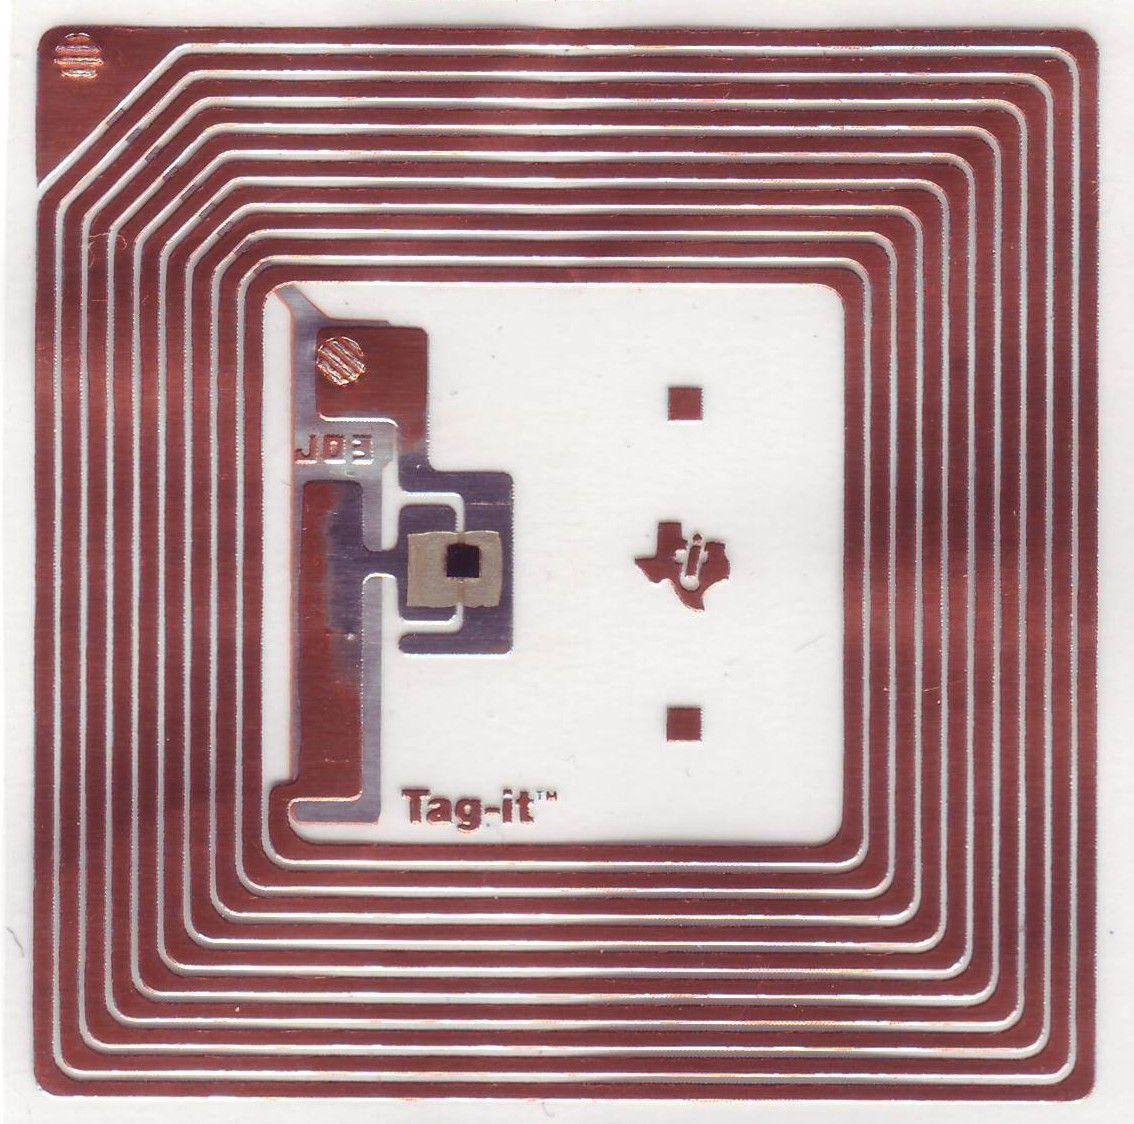 Inlay RFID